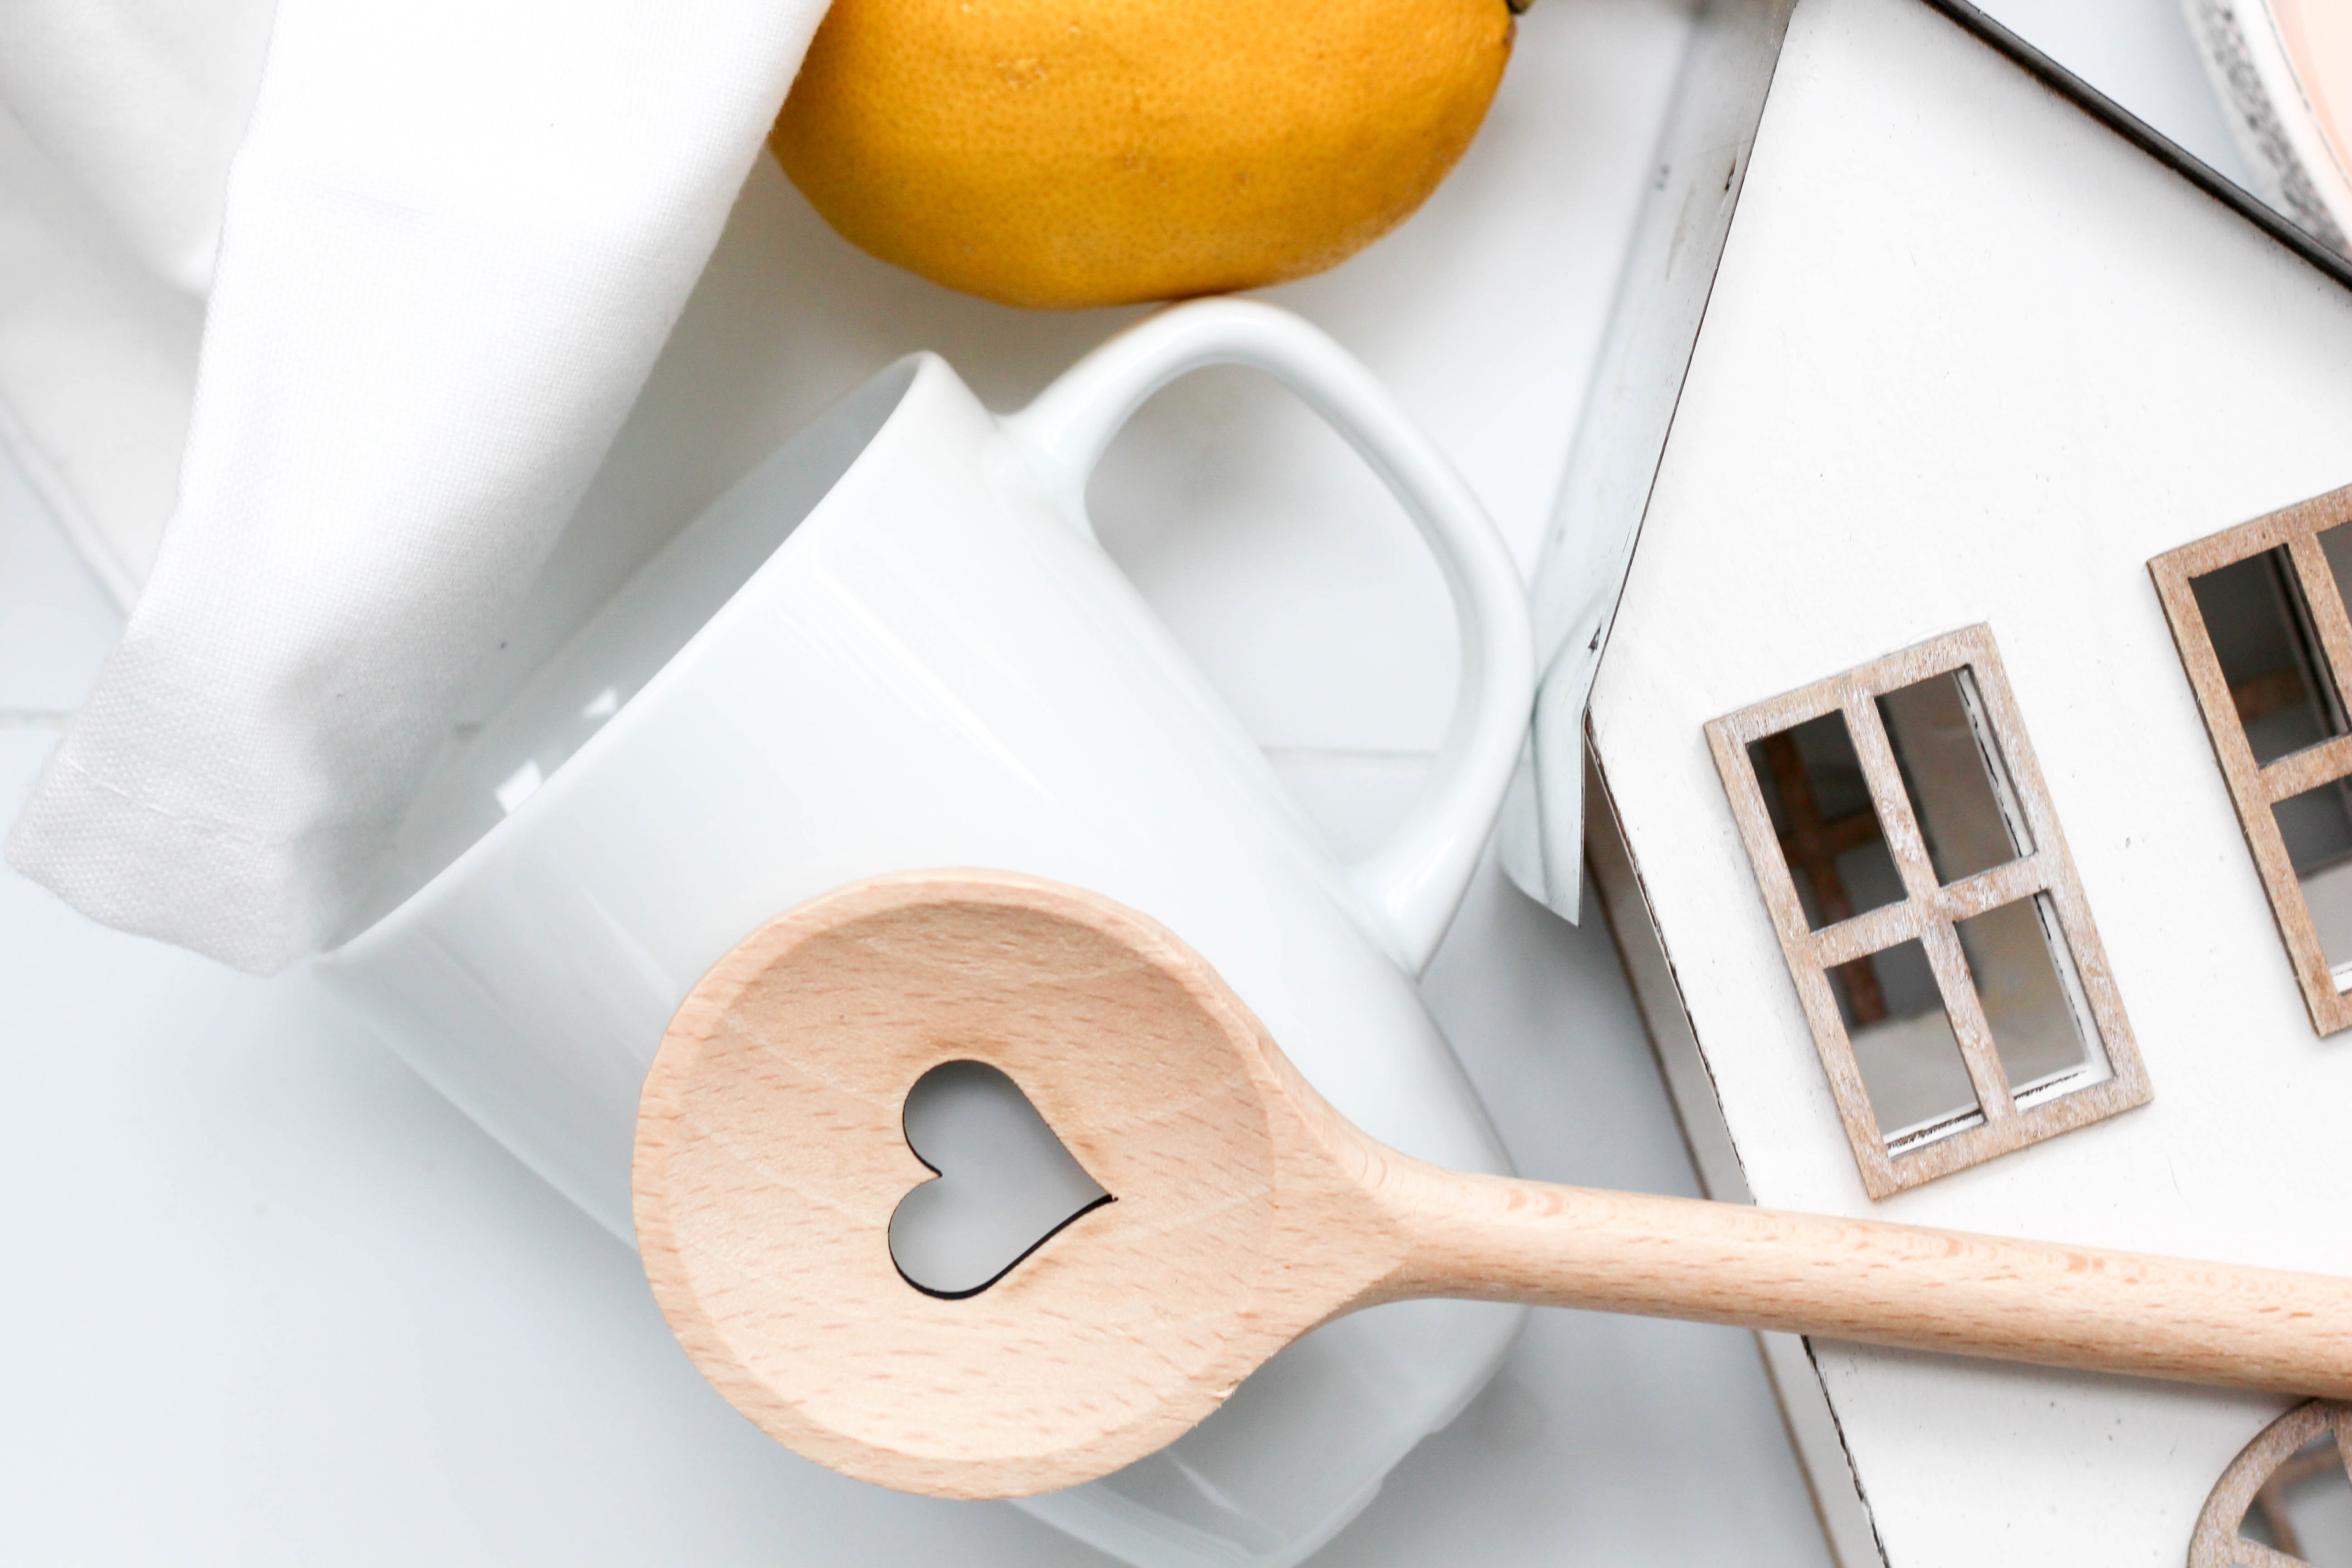 Vegan - HomeSpa - Küche - Tricks - Nachhaltig - Flatlay - Kochlöffel -Nachhaltigkeit